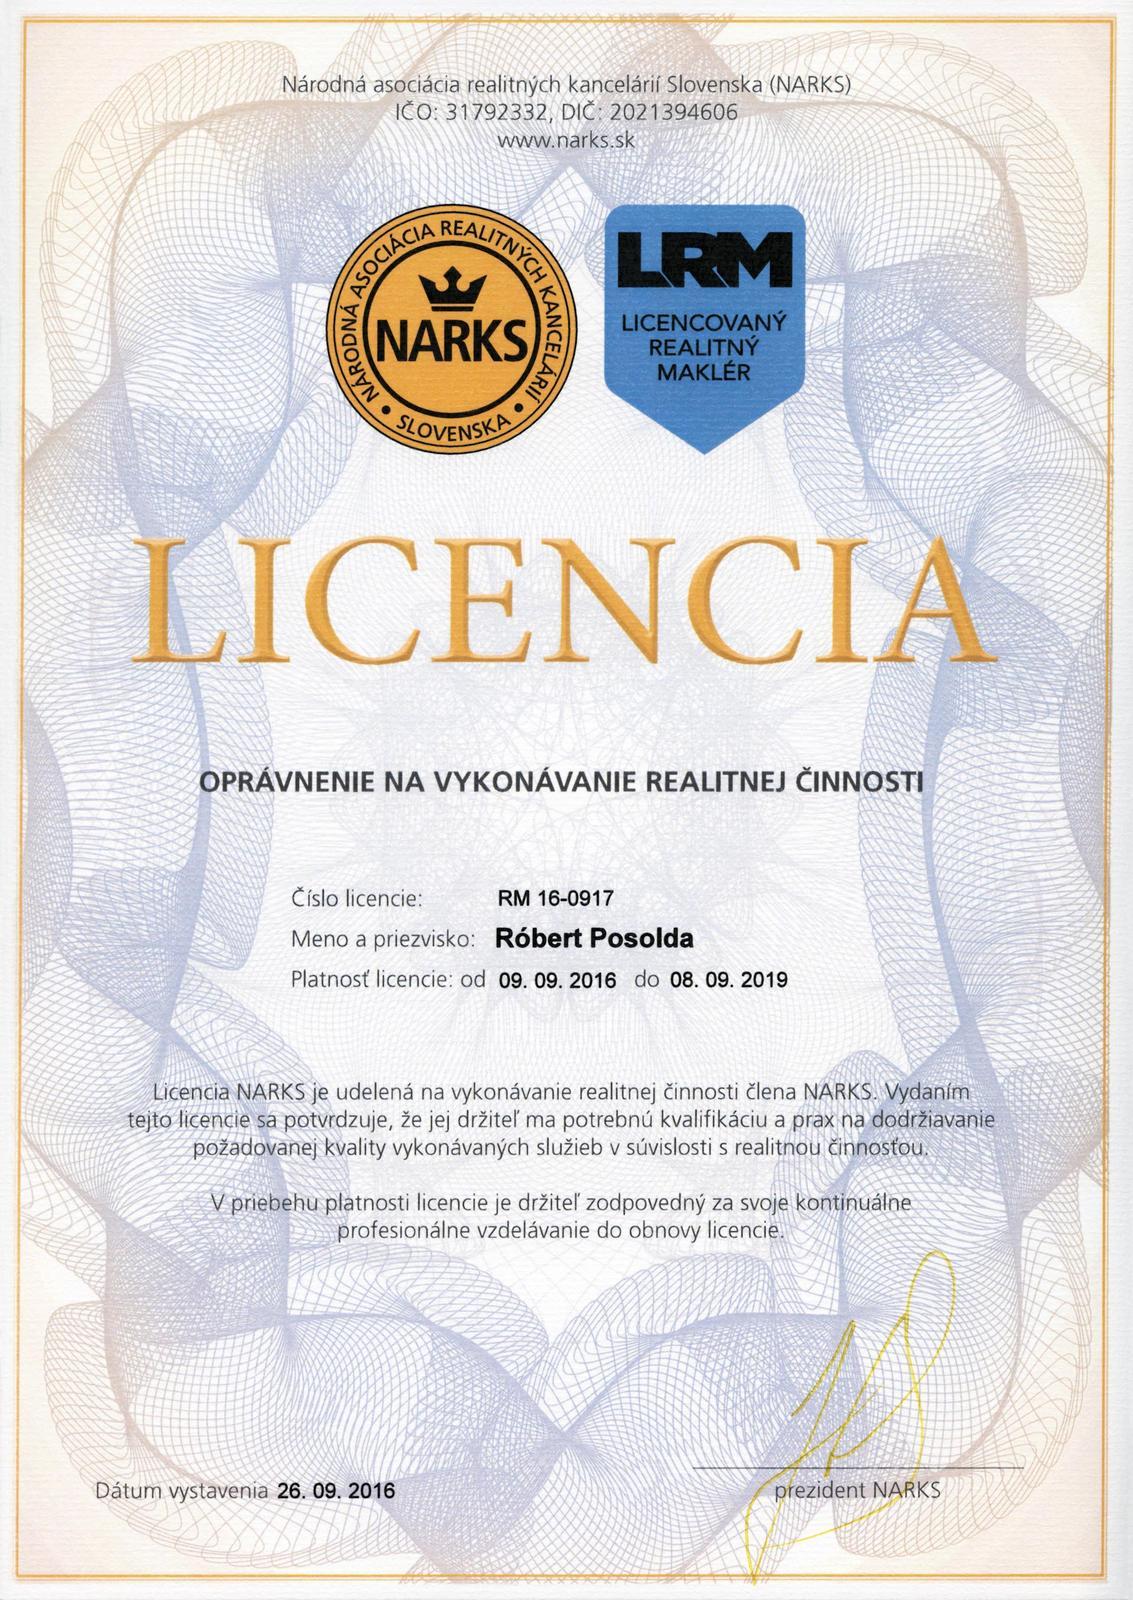 smartbrokers - Licencia realitného makléra